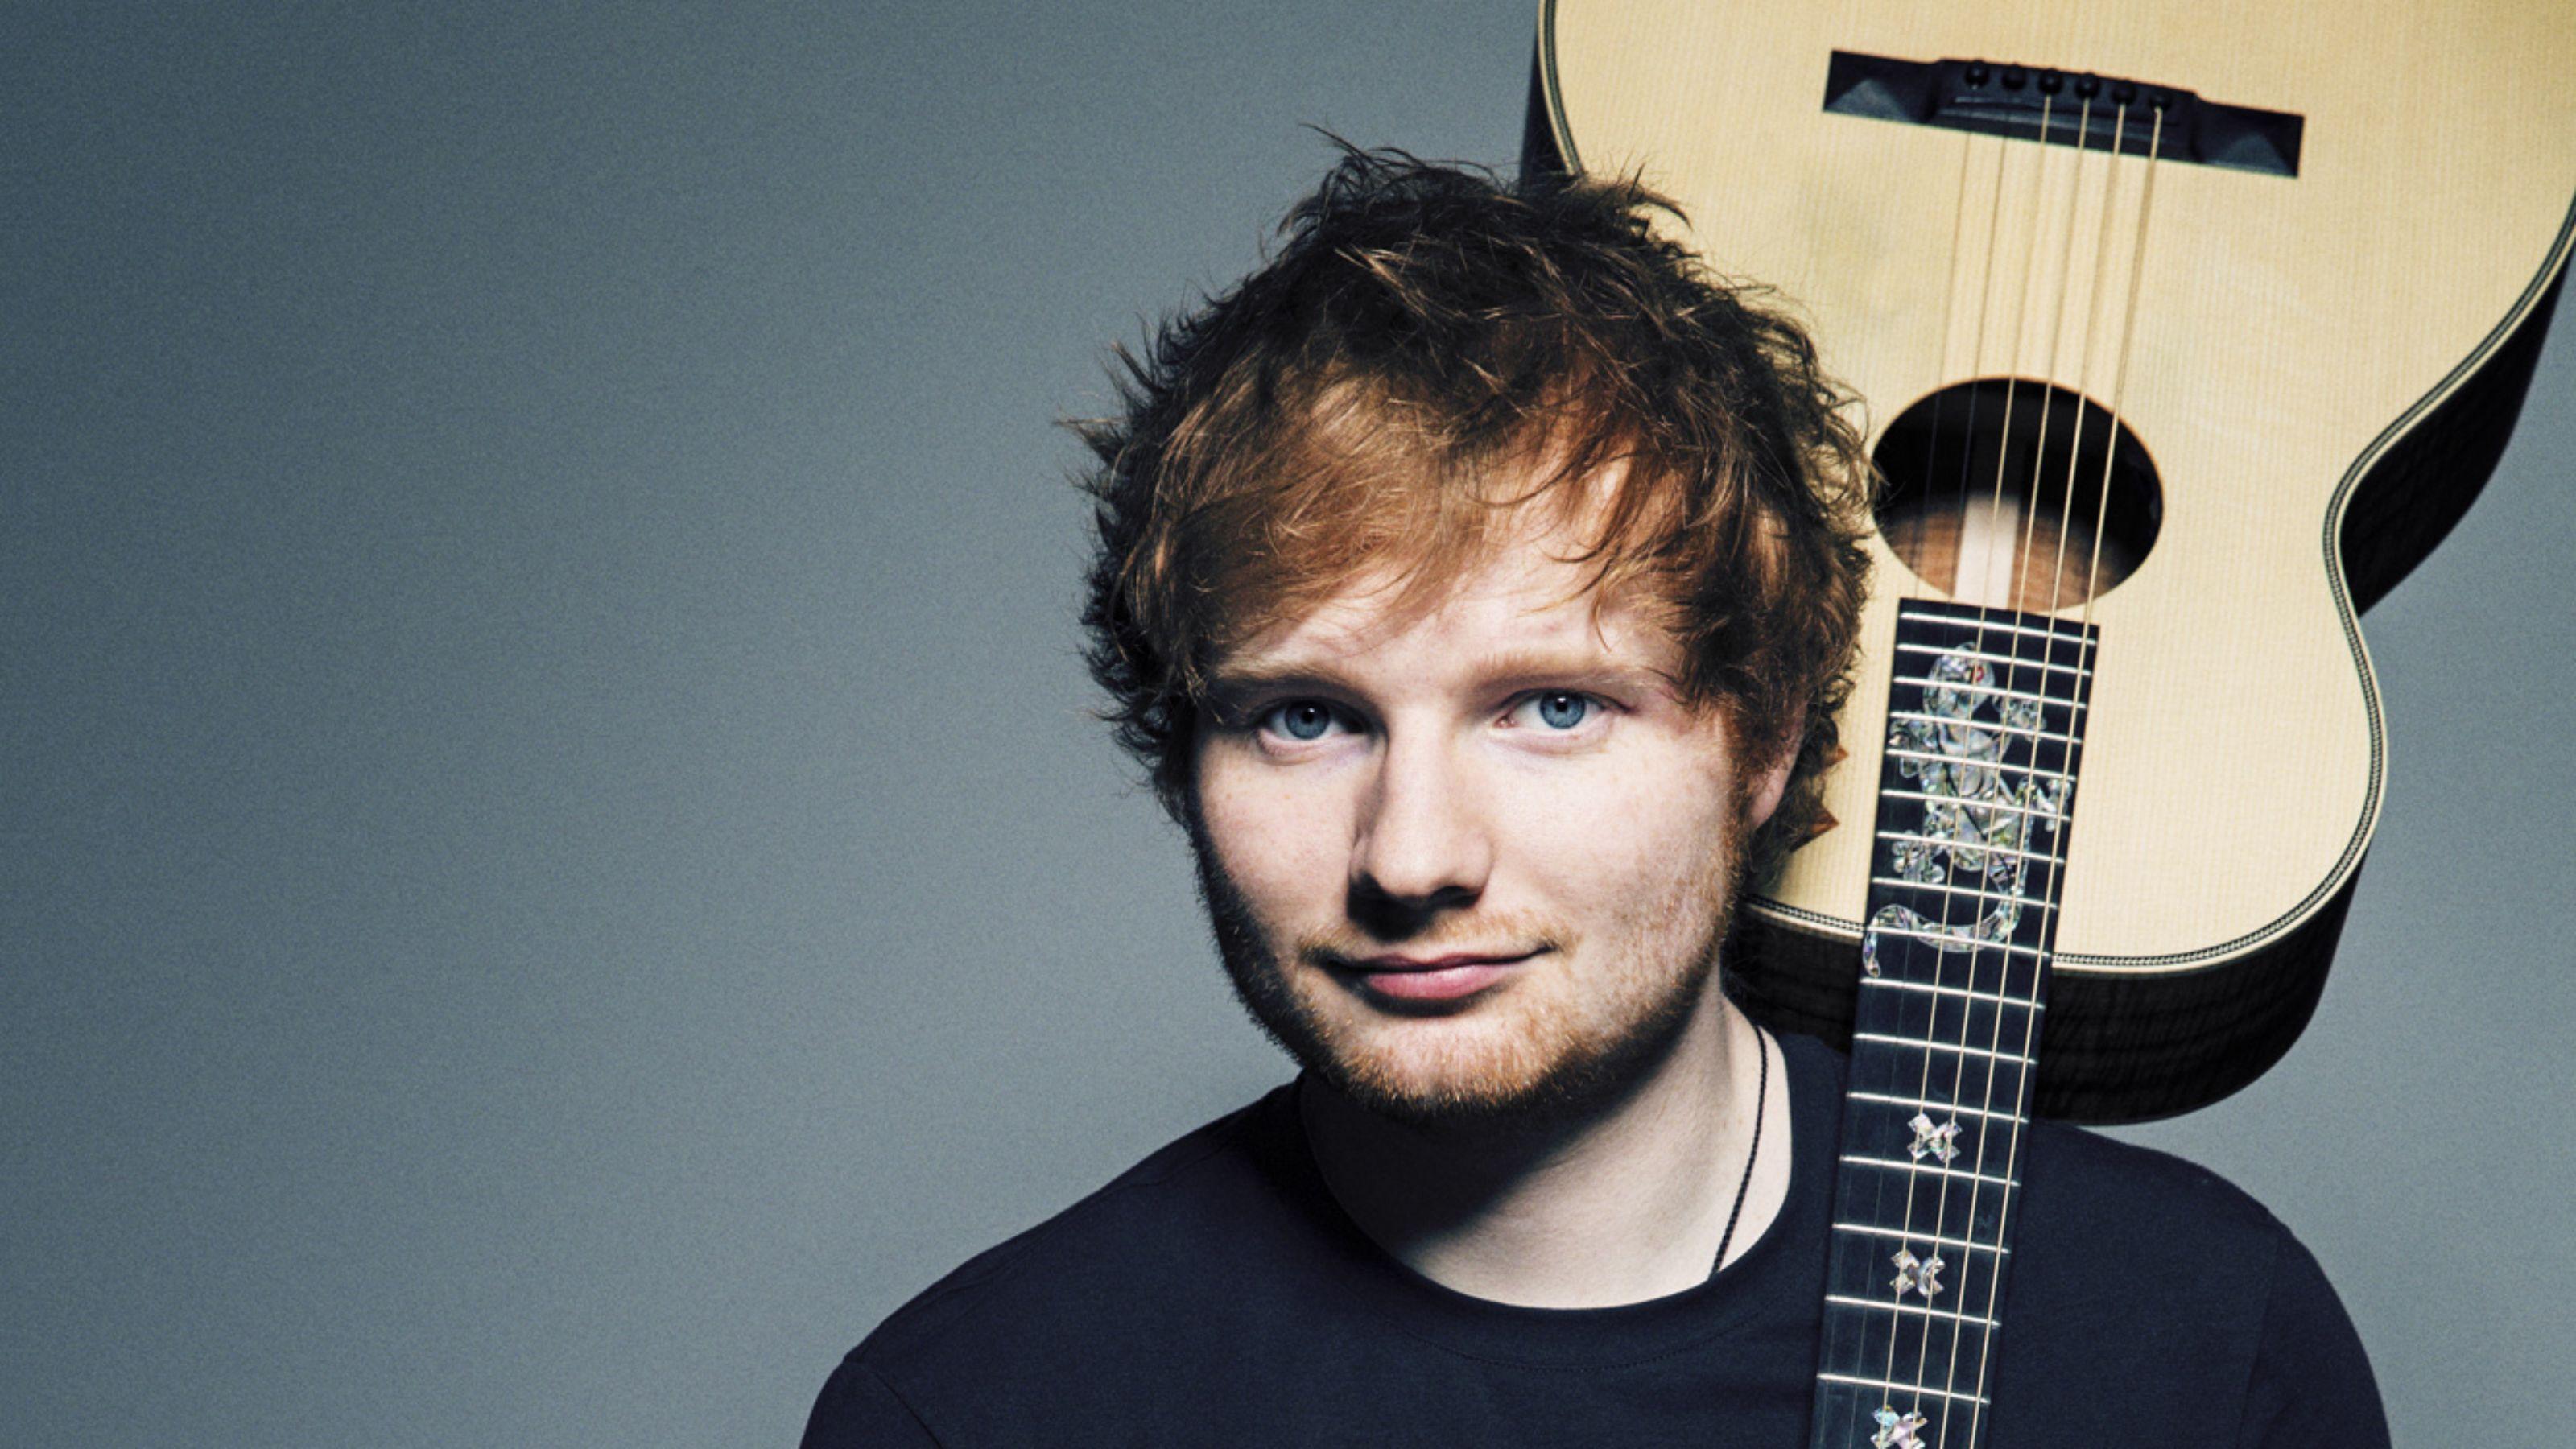 Ed Sheeran Wallpapers Hd